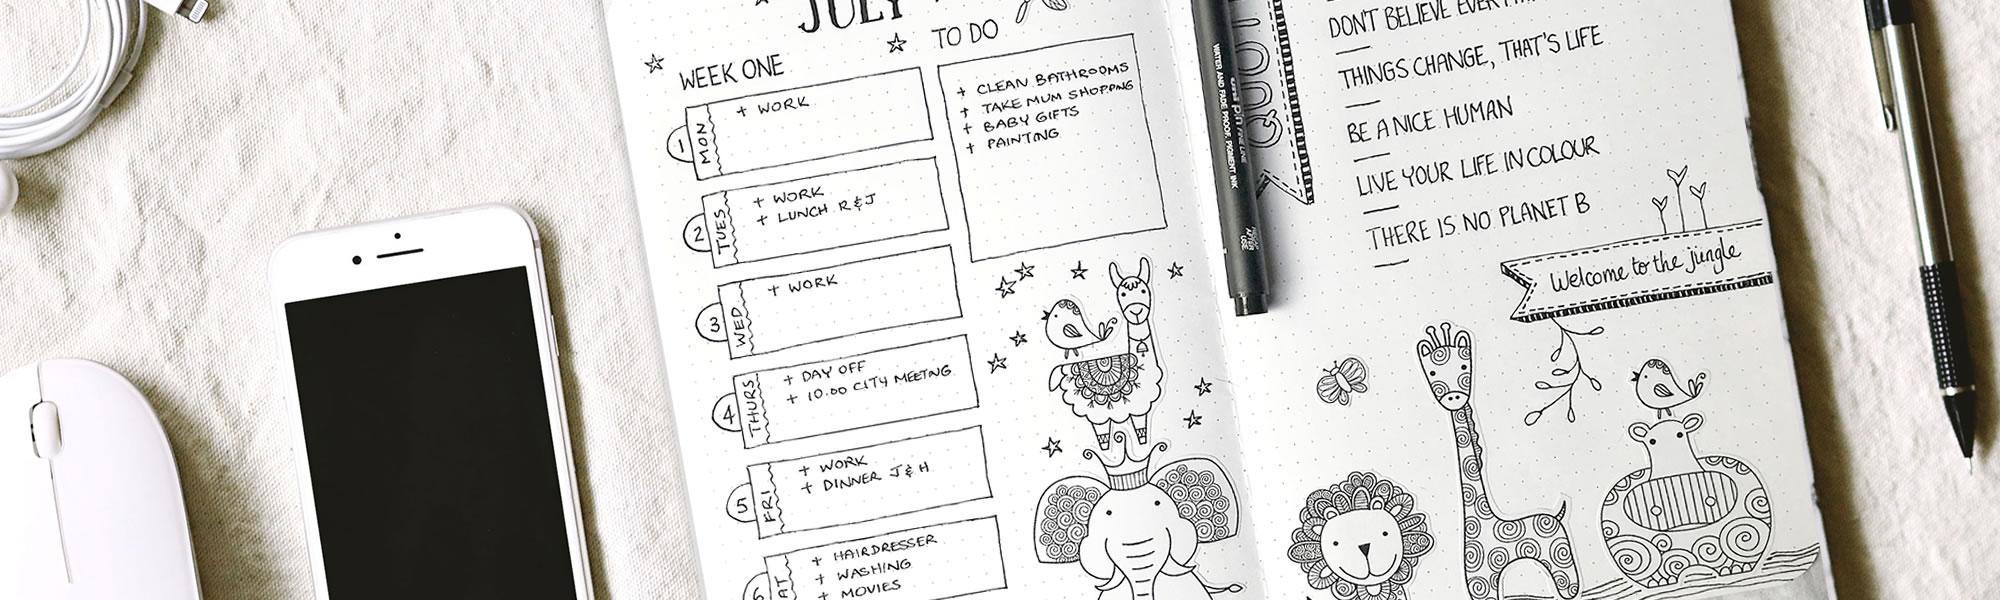 DIY header journal